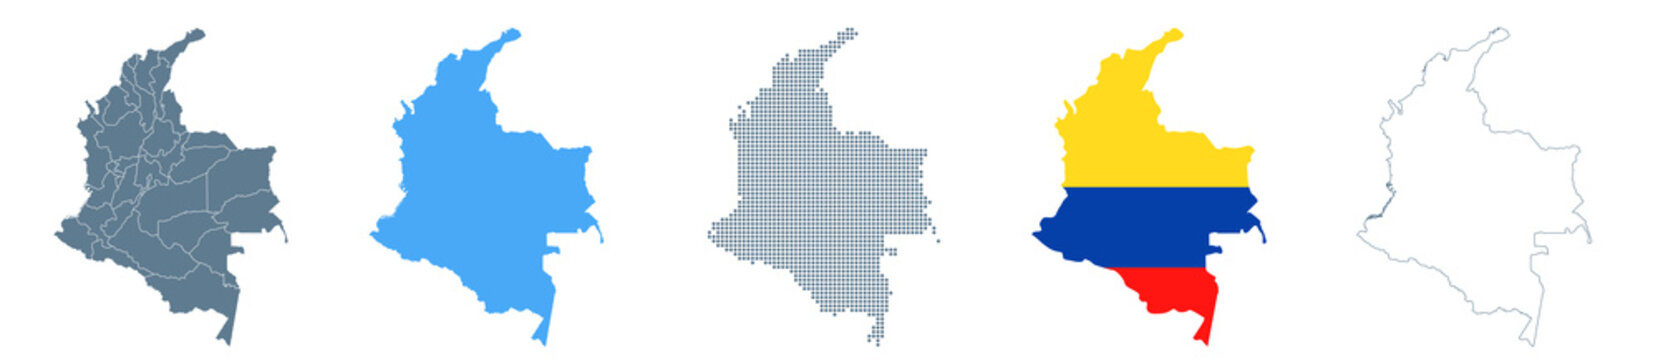 Colombia Map Set - Vector Solid, Contour, Regions, Flag, Pixels